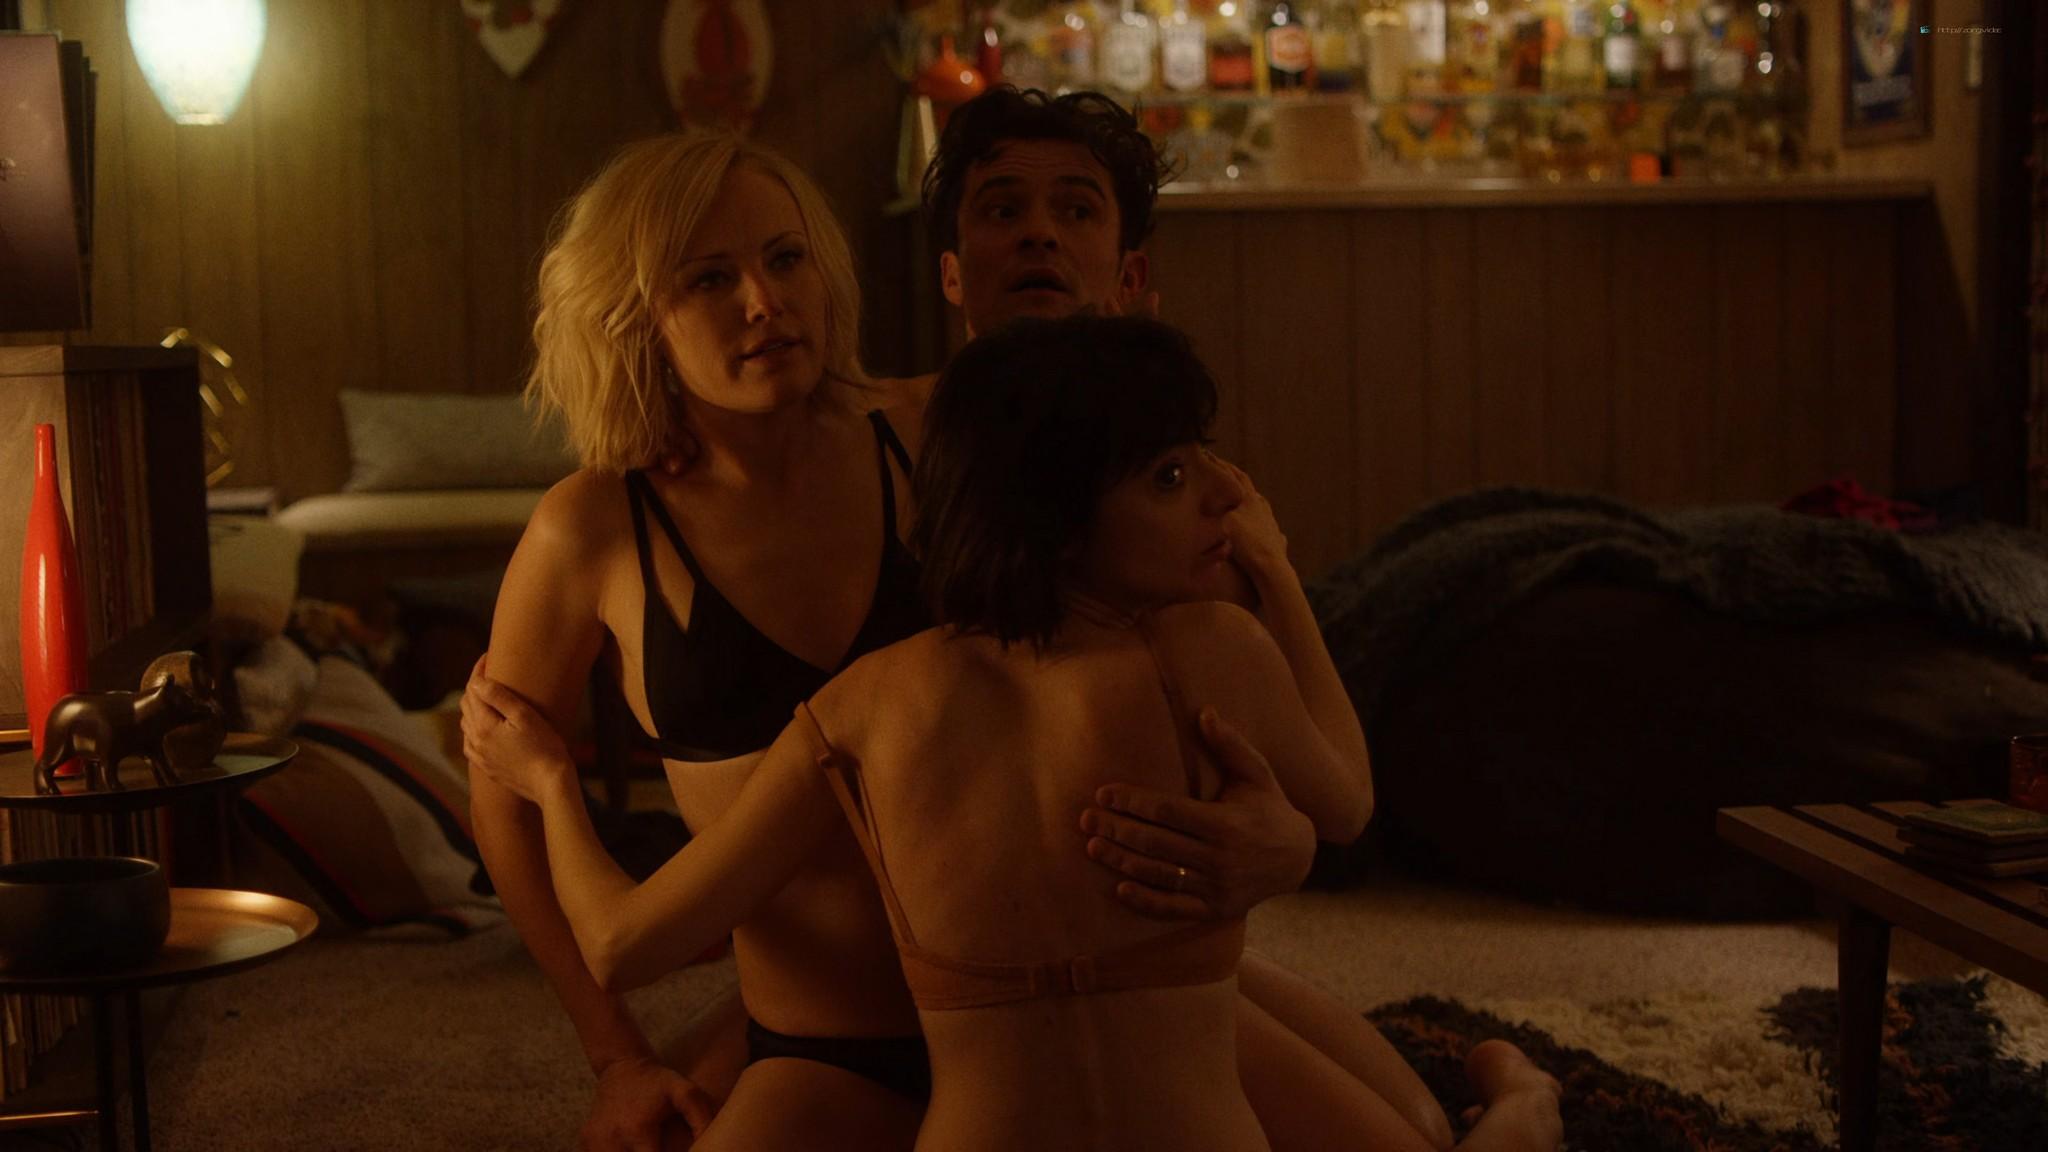 Malin Akerman nude sex threesome with Kate Micucci Easy 2016 s1e6 UHD 2160 1080p 005